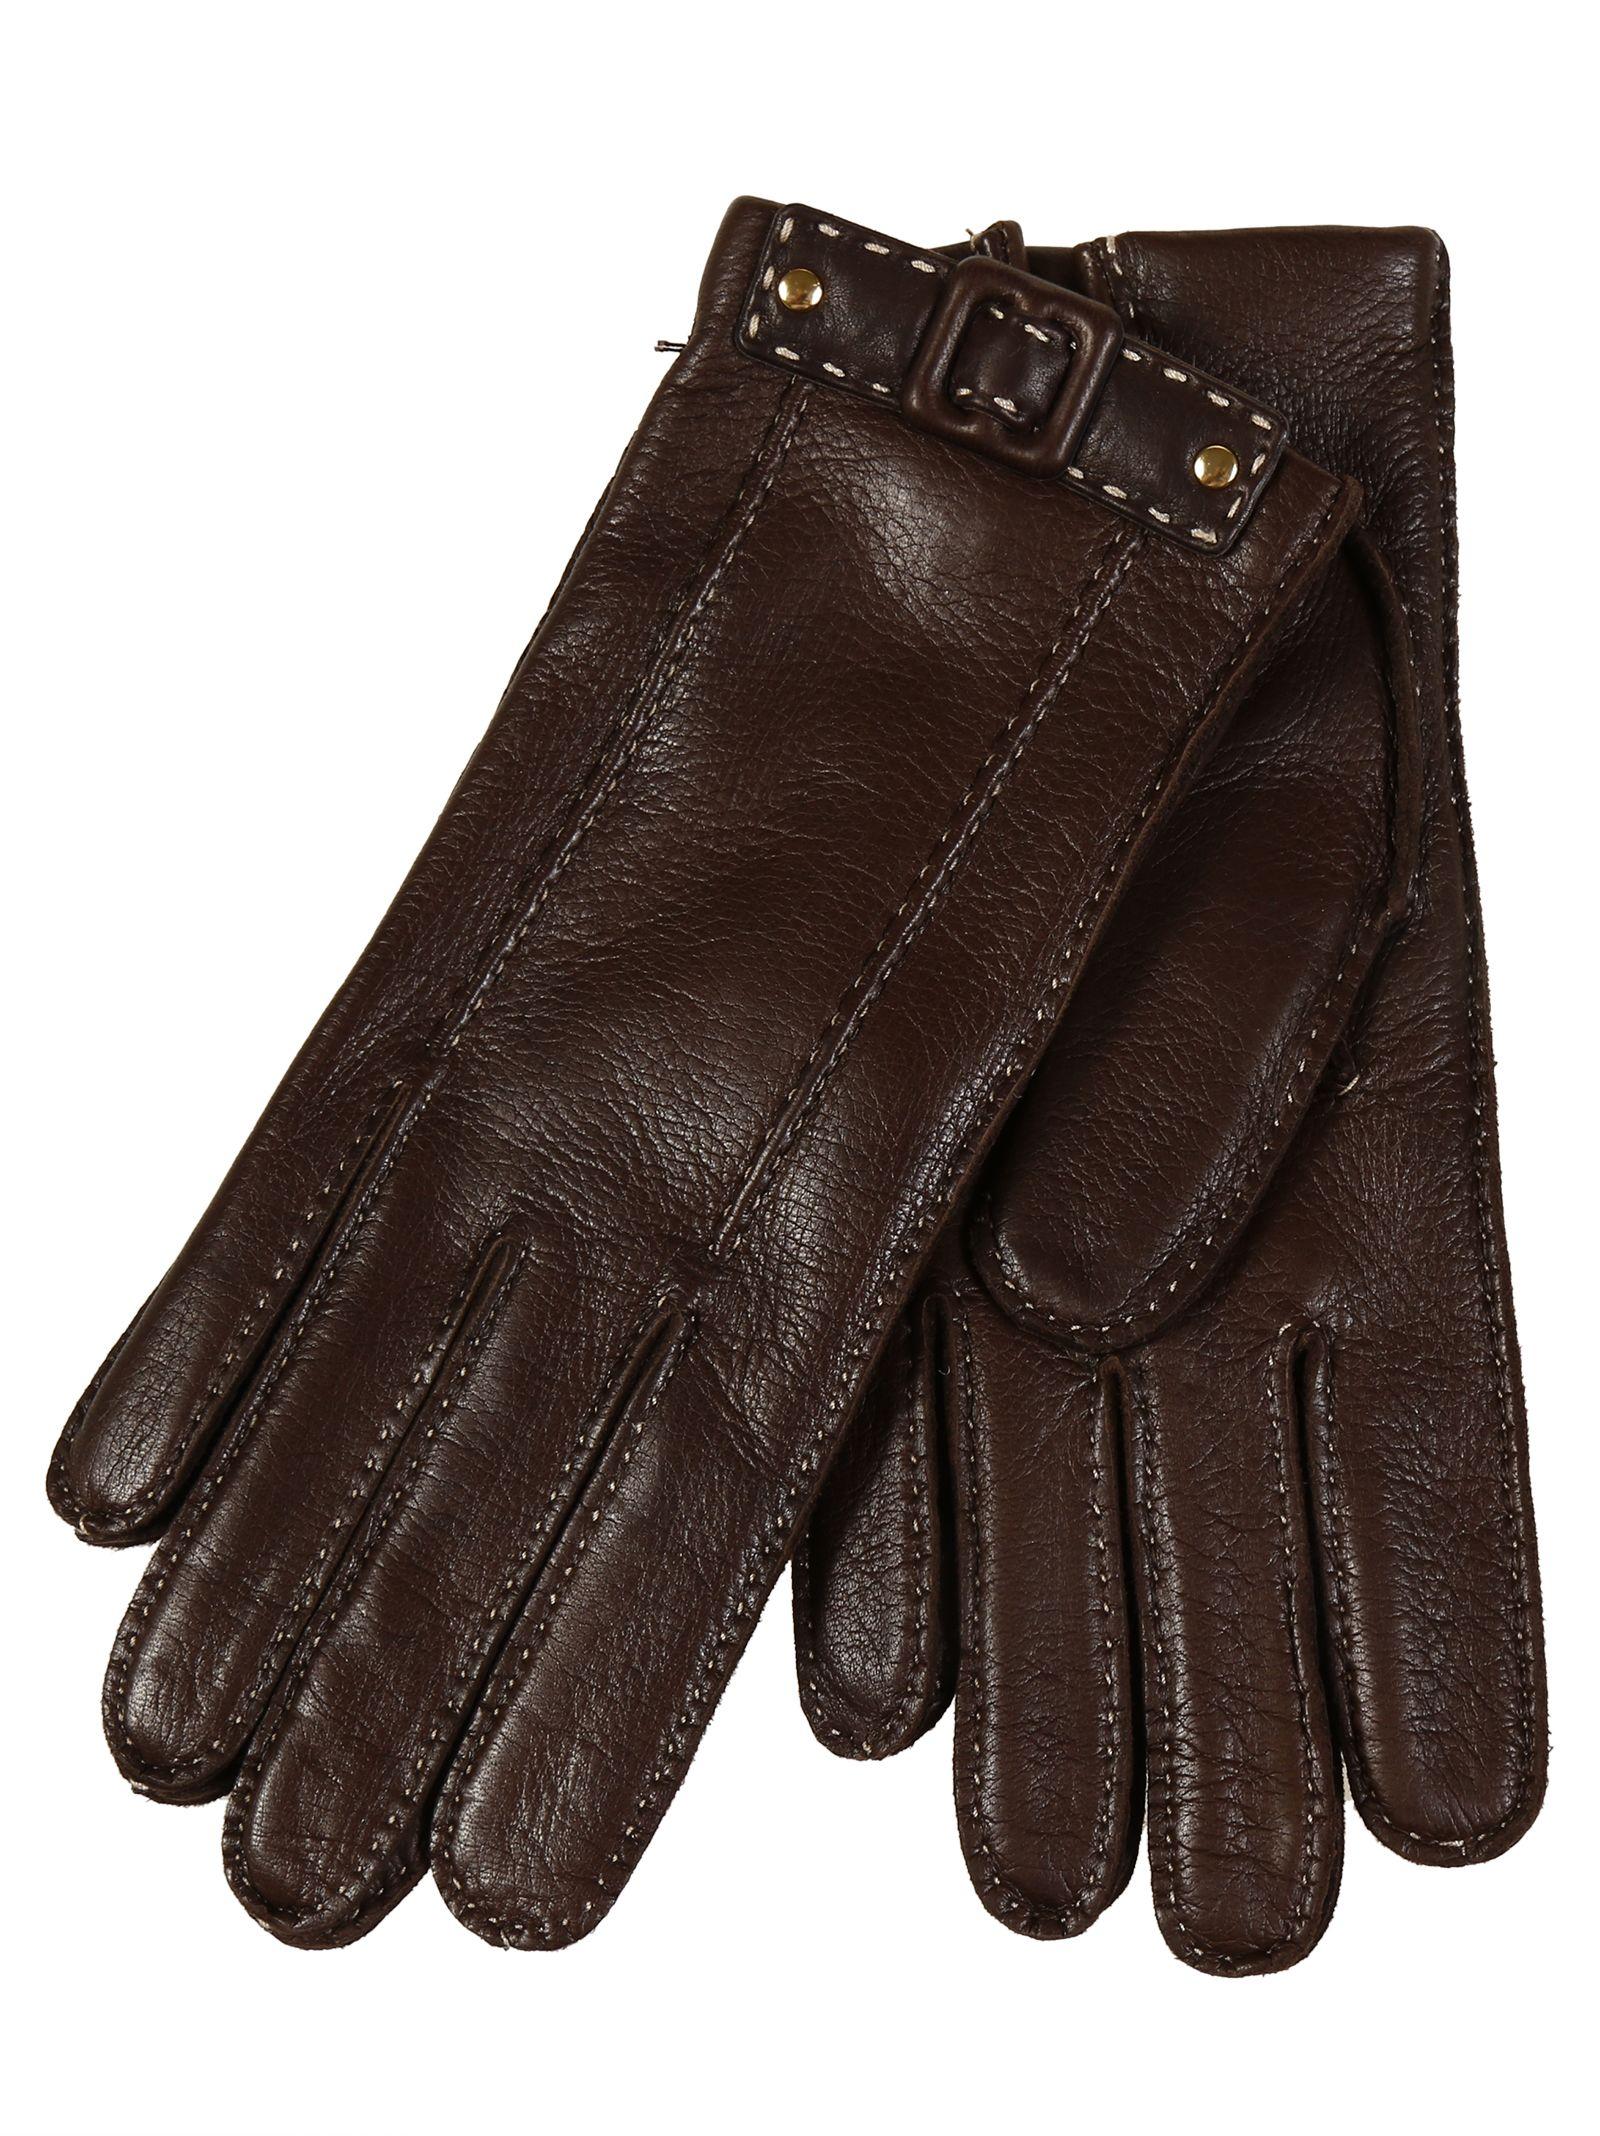 Restelli Deer Gloves With selleria belt.